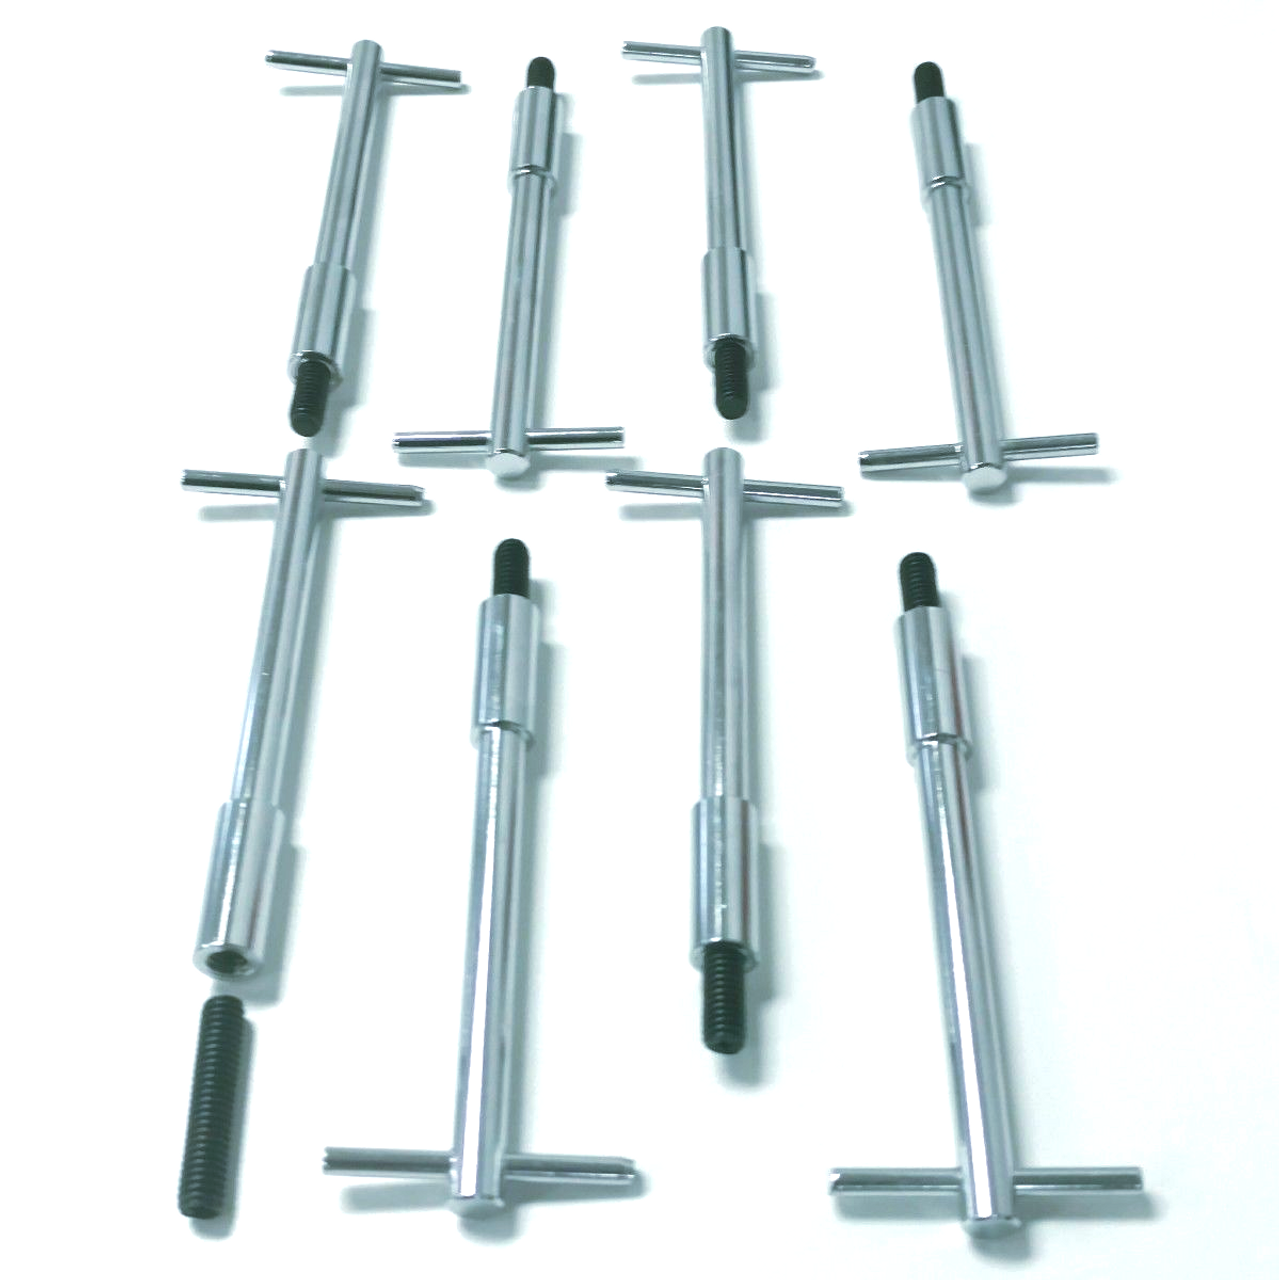 (8) Muscle Car Chrome Steel Valve Cover T-Bar V8 332 352 390 406 427 429-460